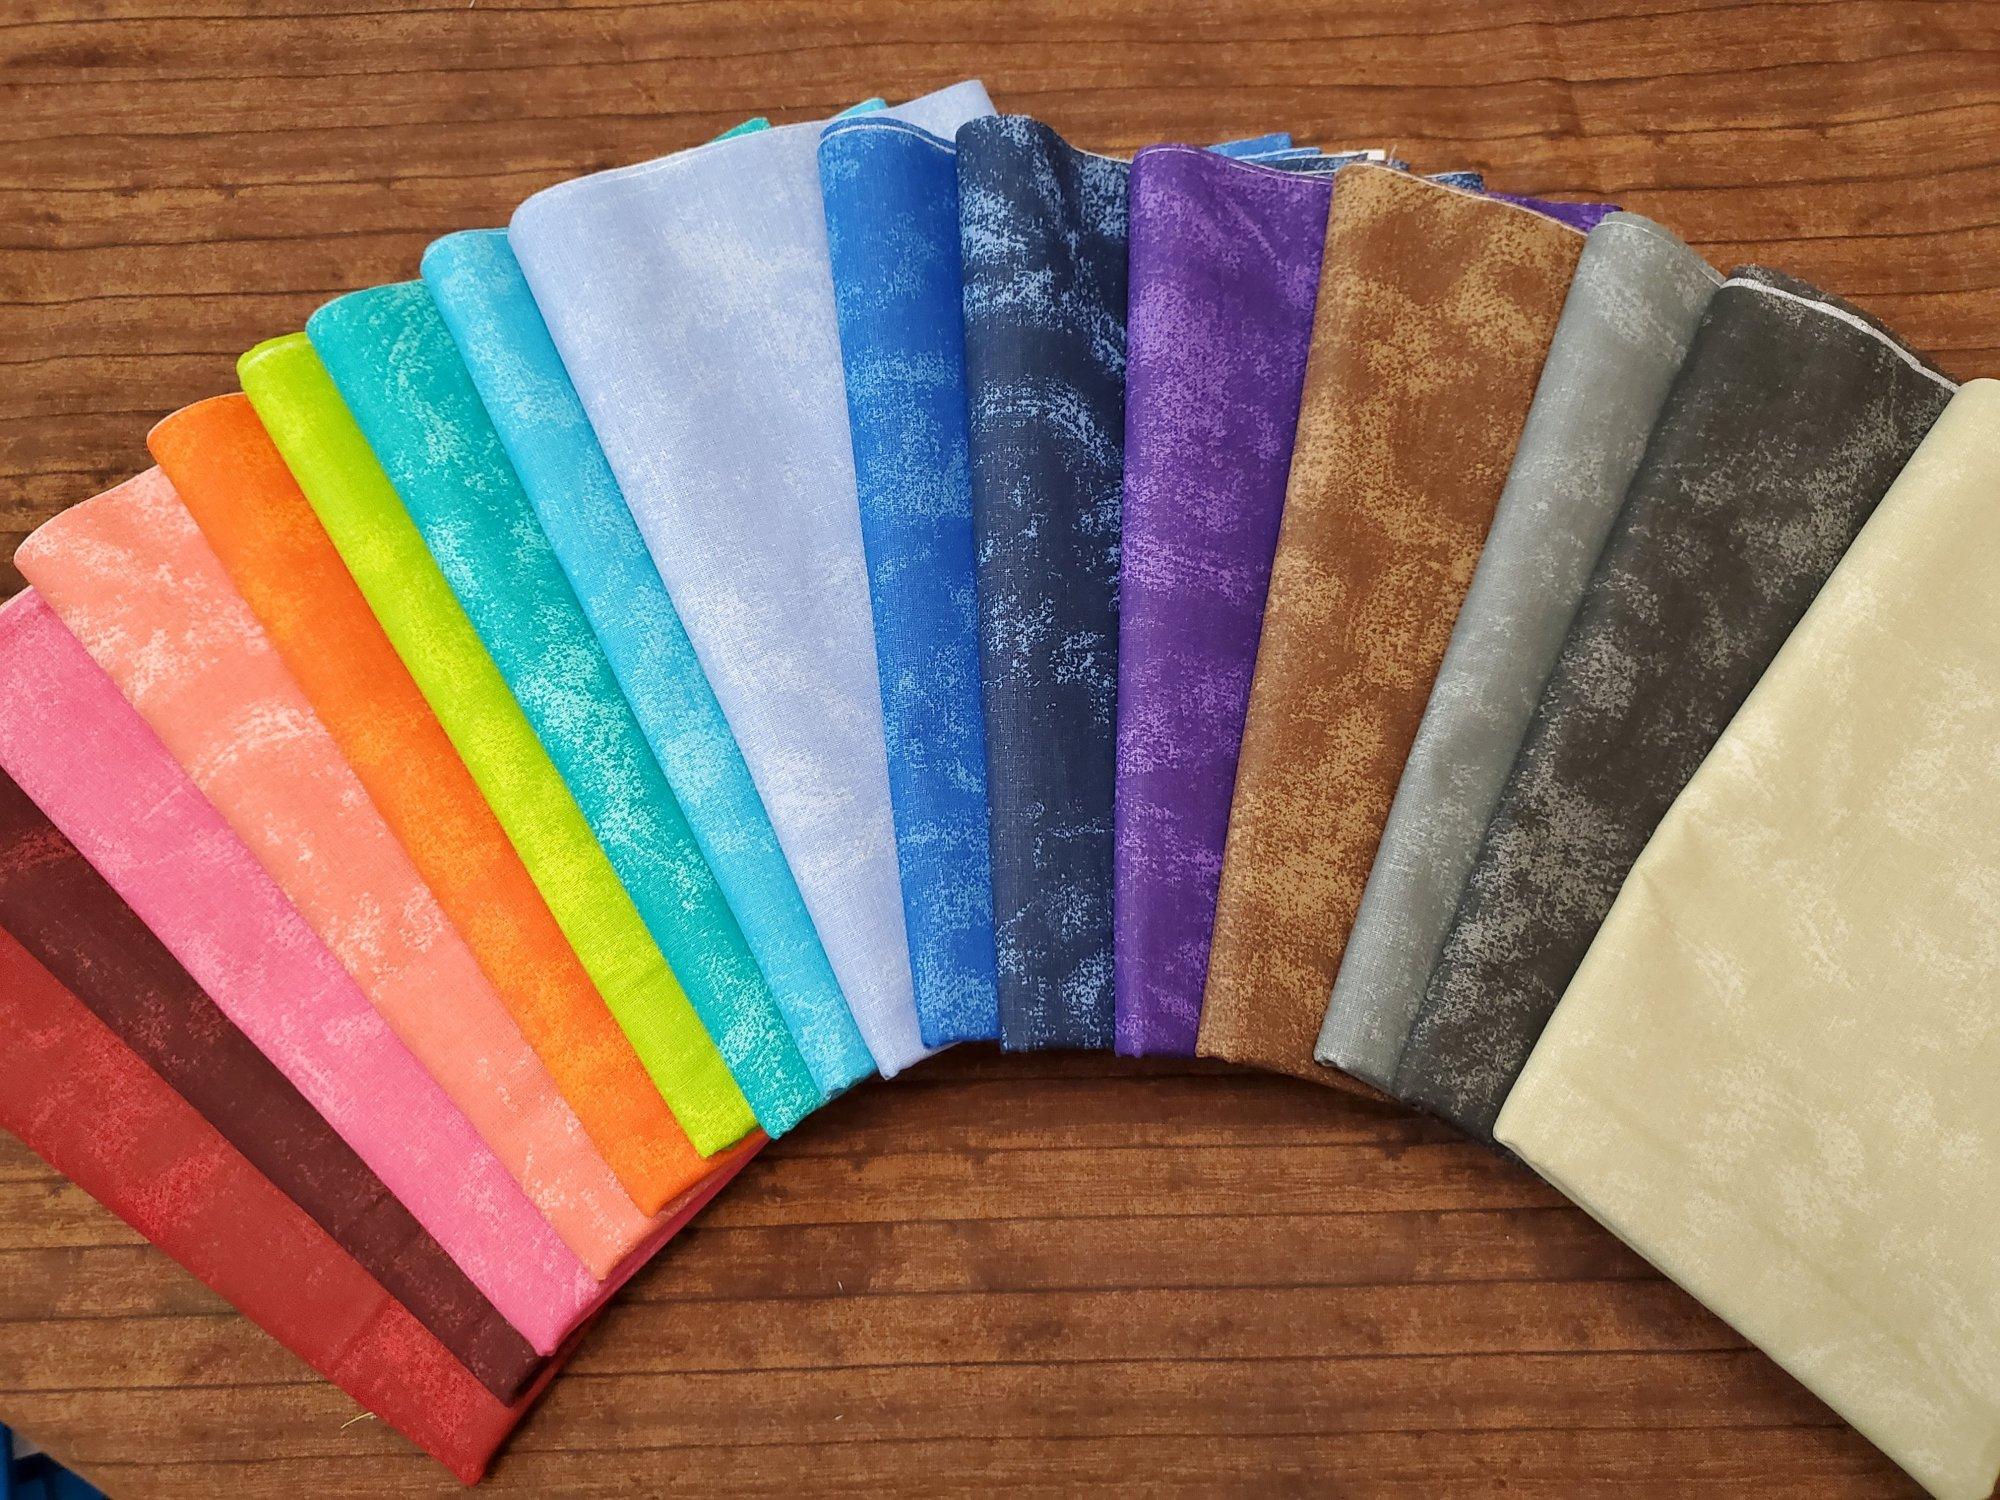 Cloudy - Rachael's Picks - 16 Piece Half Yard Bundle Pack